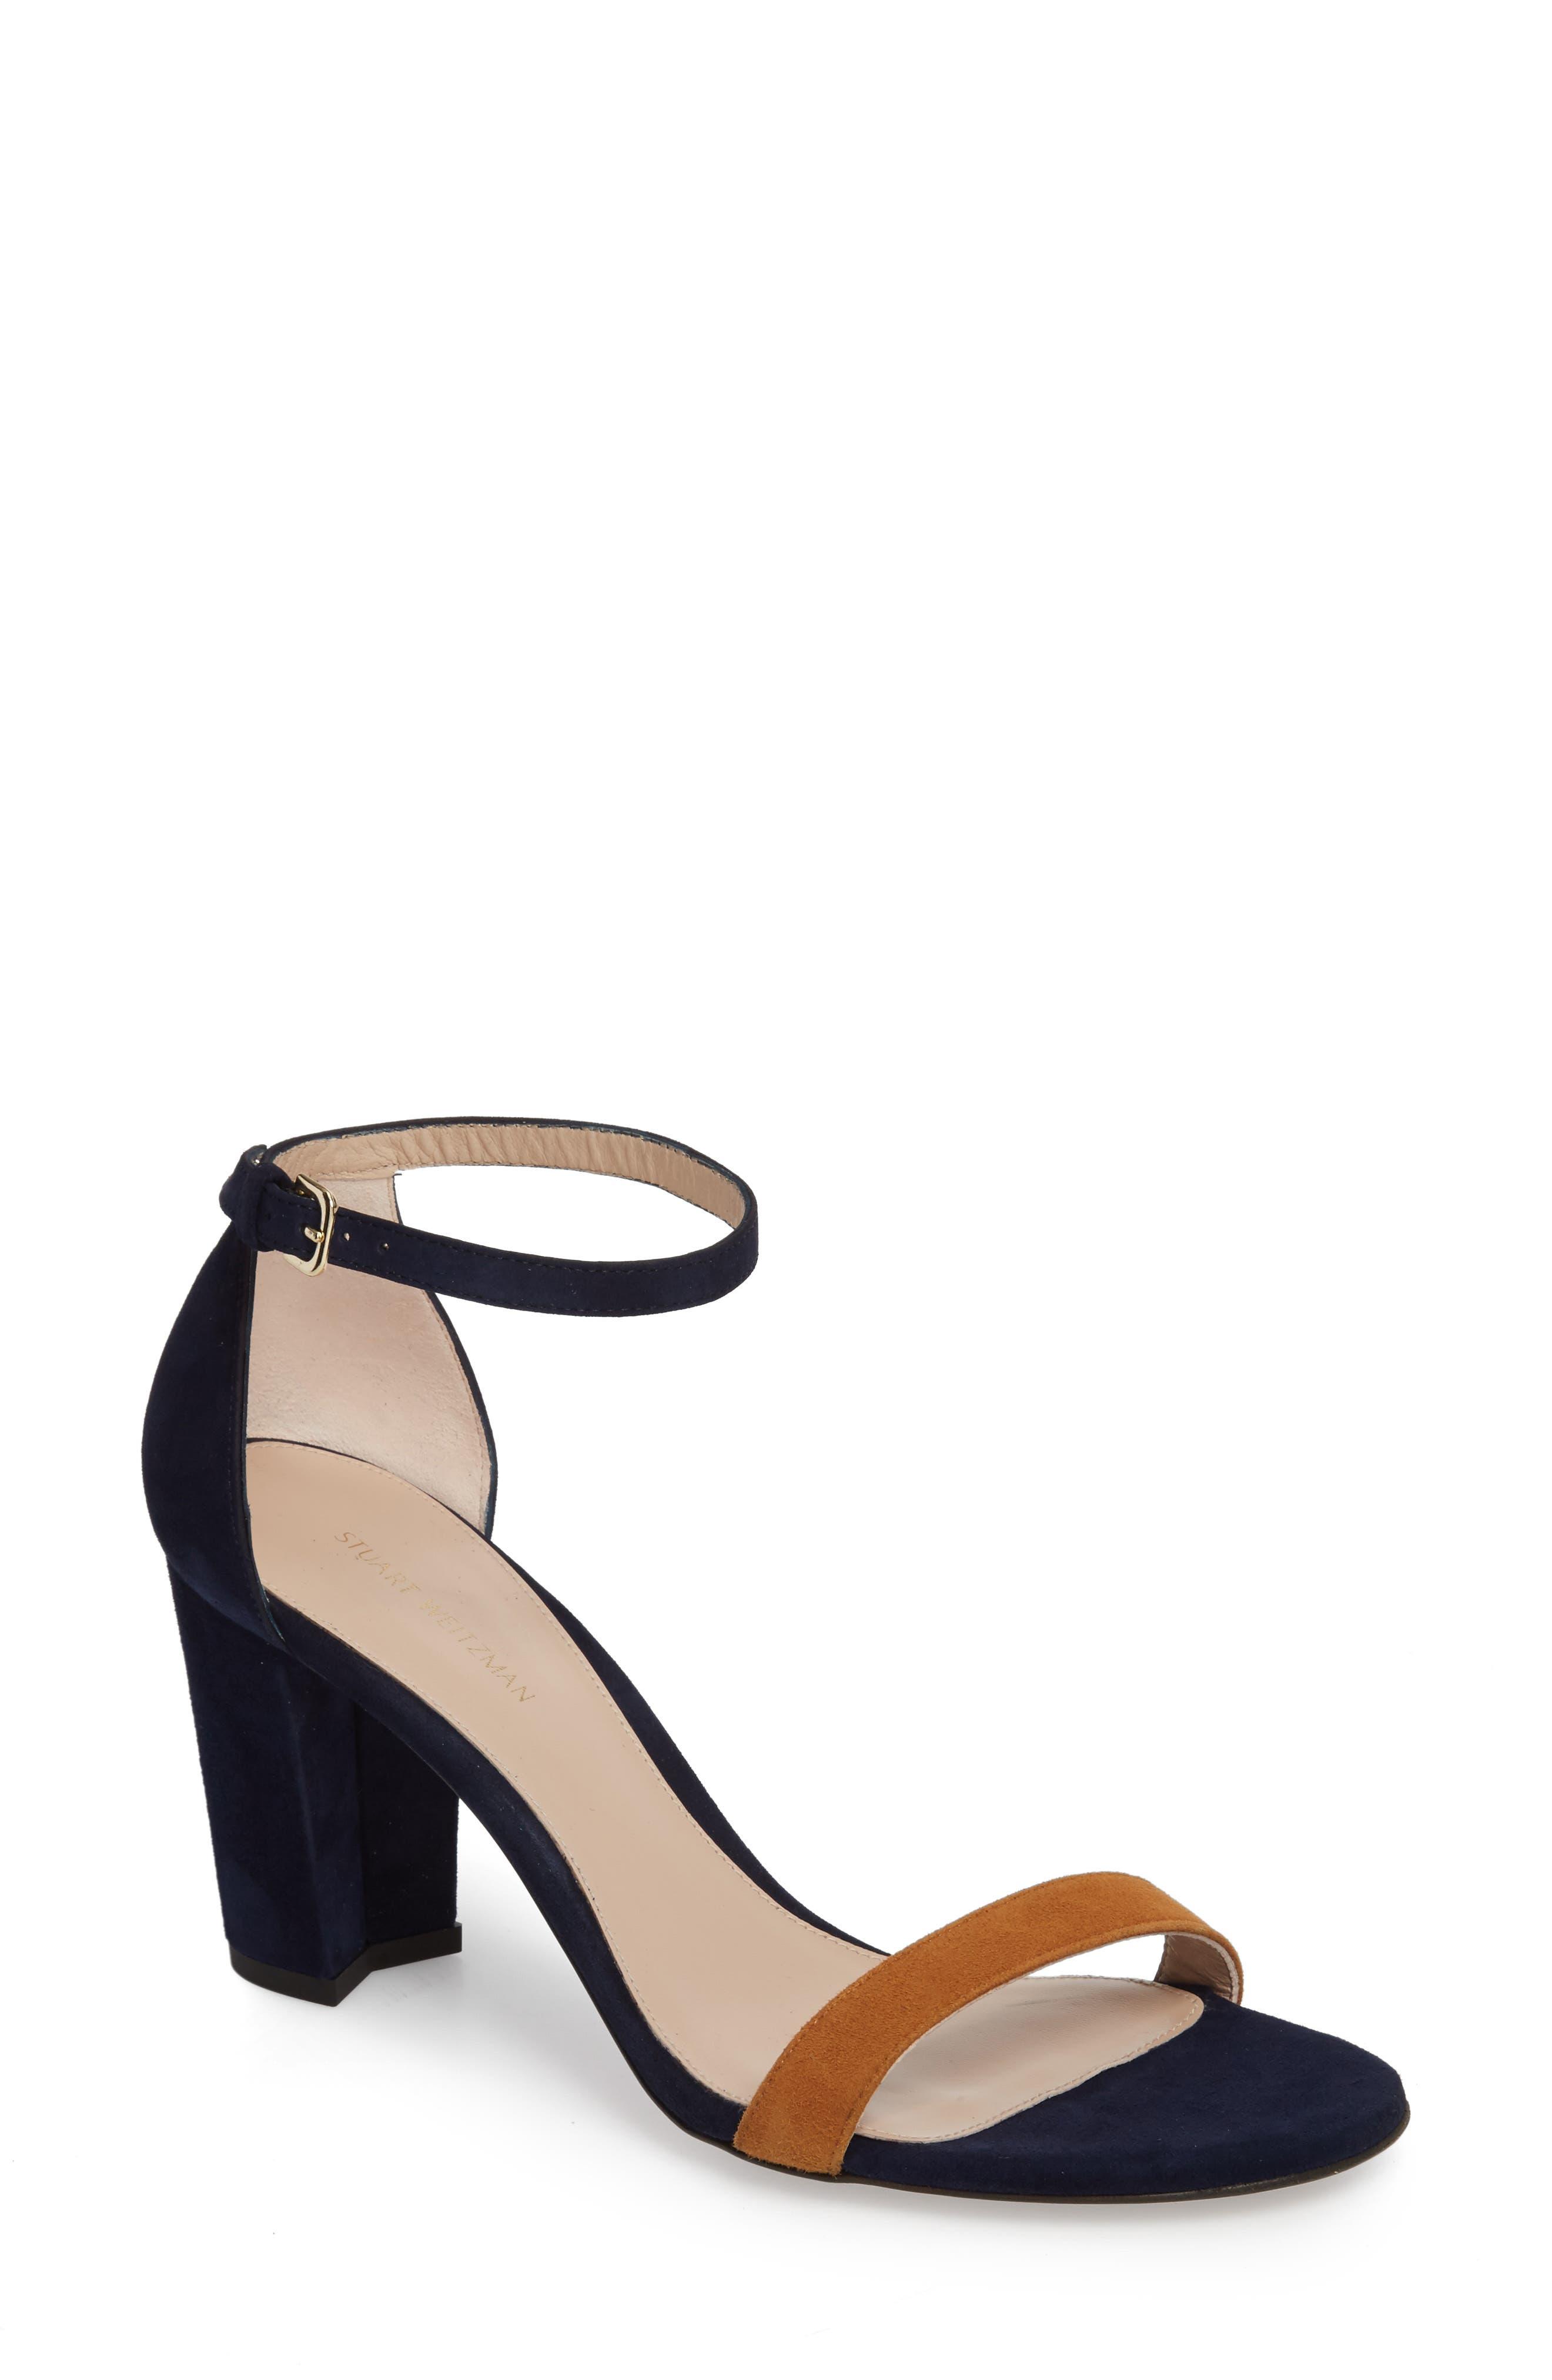 Alternate Image 1 Selected - Stuart Weitzman NearlyNude Ankle Strap Sandal (Women)